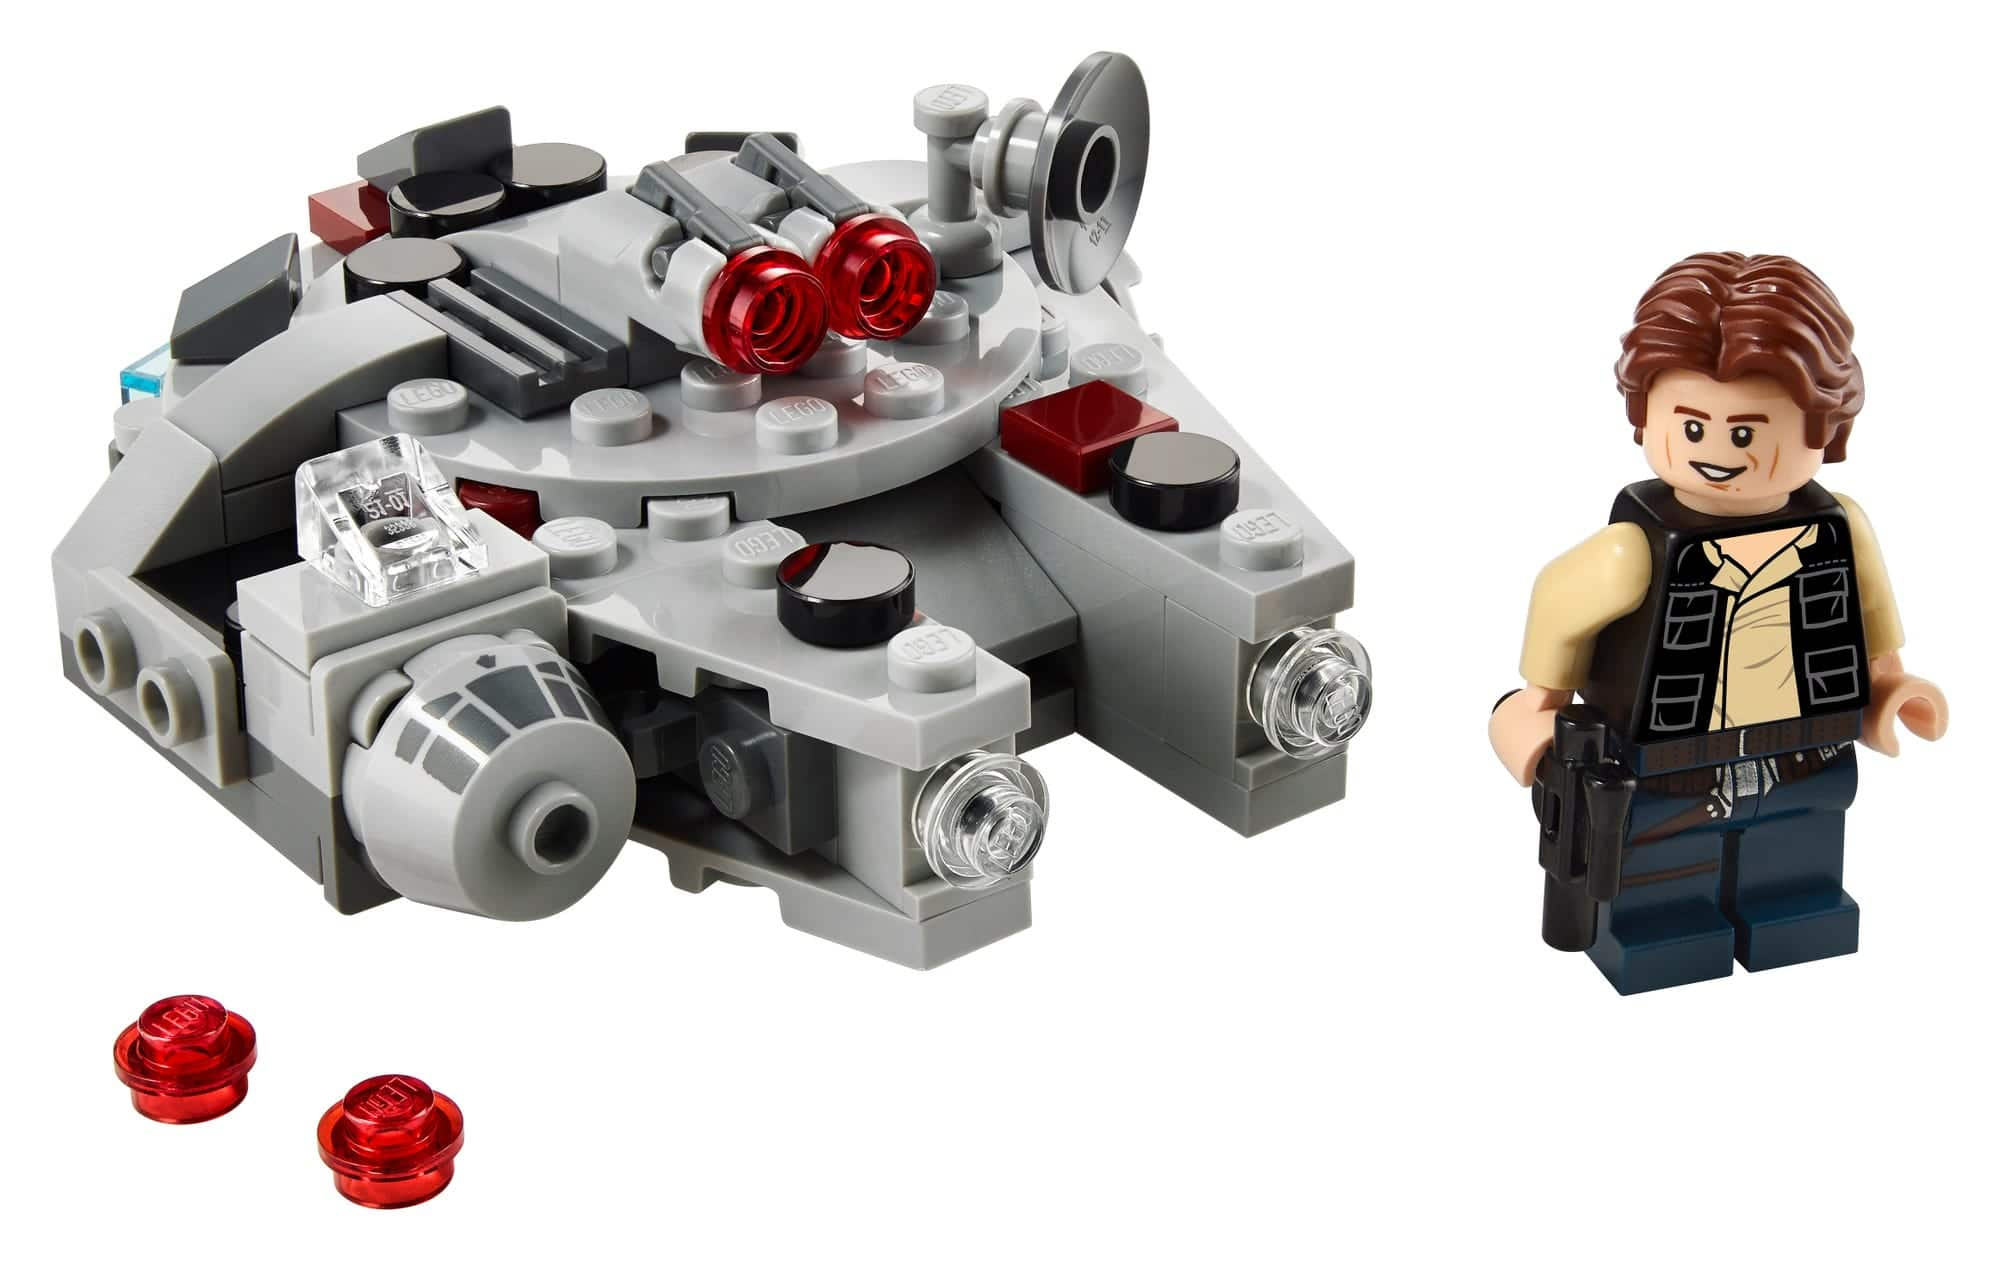 LEGO Star Wars 75295 Millennium Falcon Microfighter 3